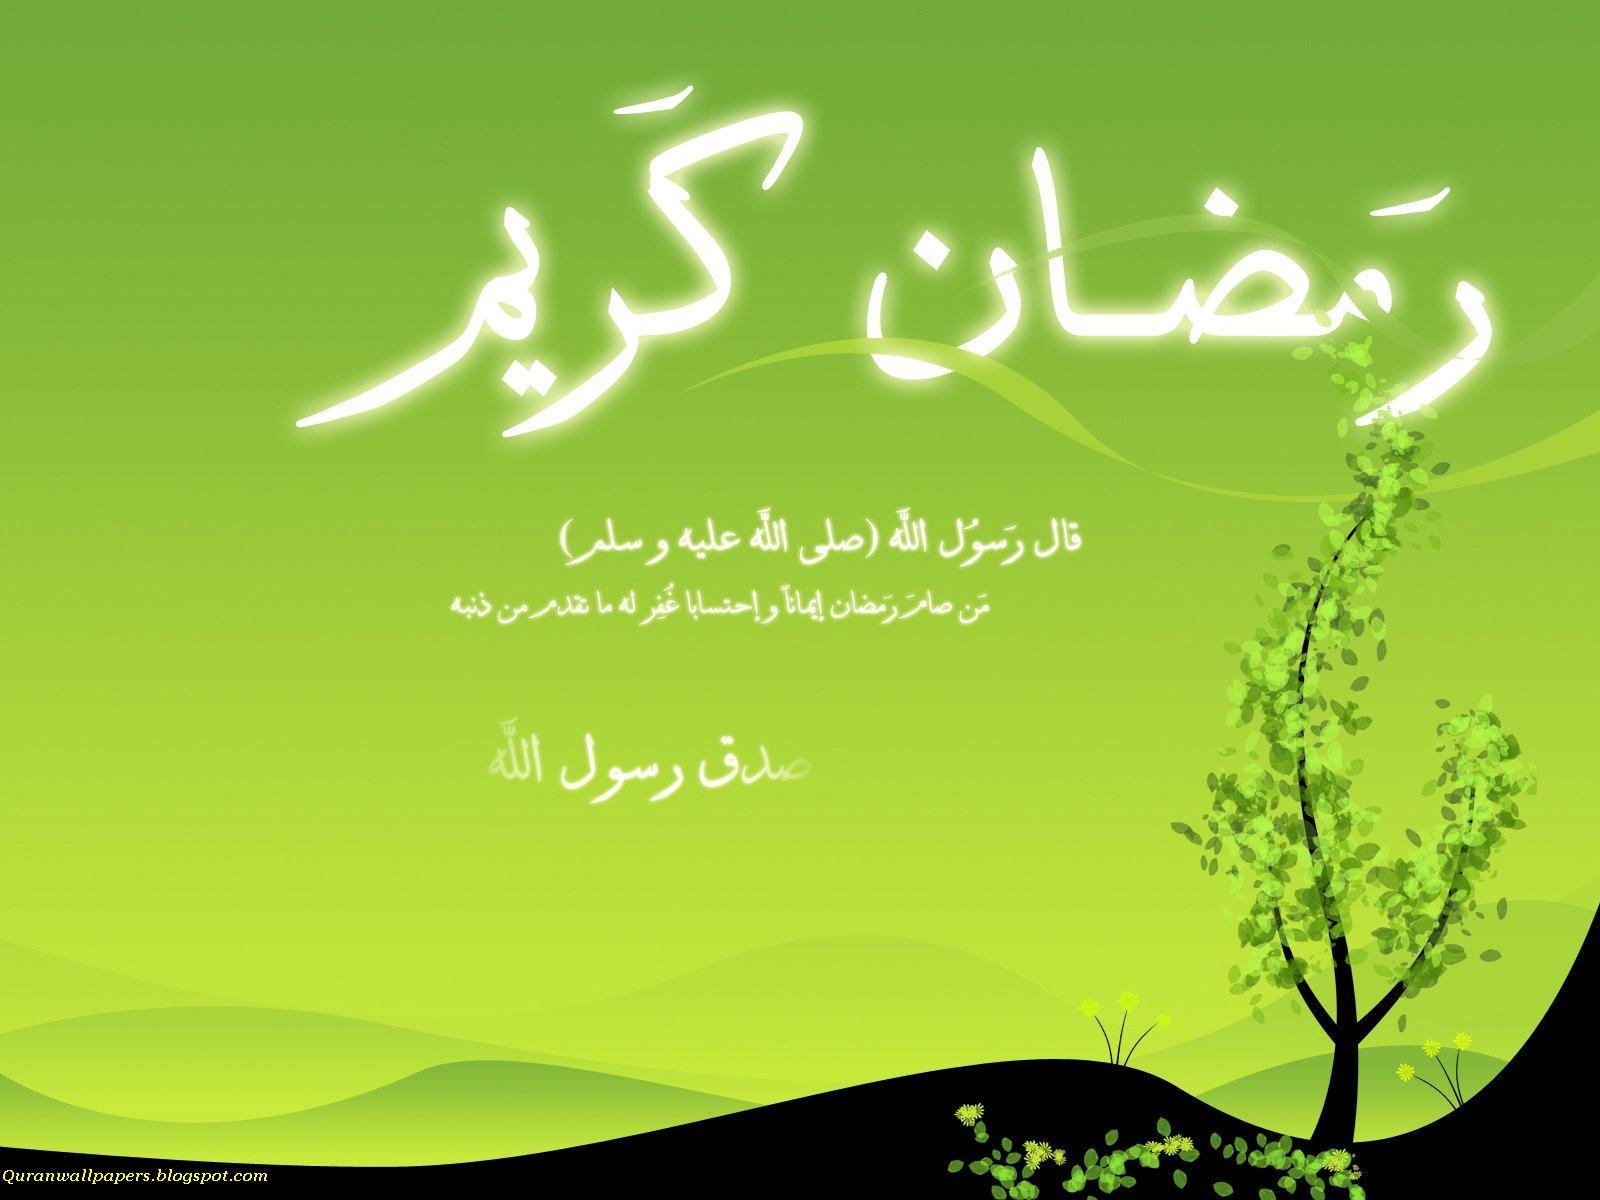 http://1.bp.blogspot.com/-duqDxZs3ZZY/Tj3quTXVDCI/AAAAAAAAANM/YlFI6Kyh1Mo/s1600/Ramadan-wallpaper_green_1600x1200.jpg